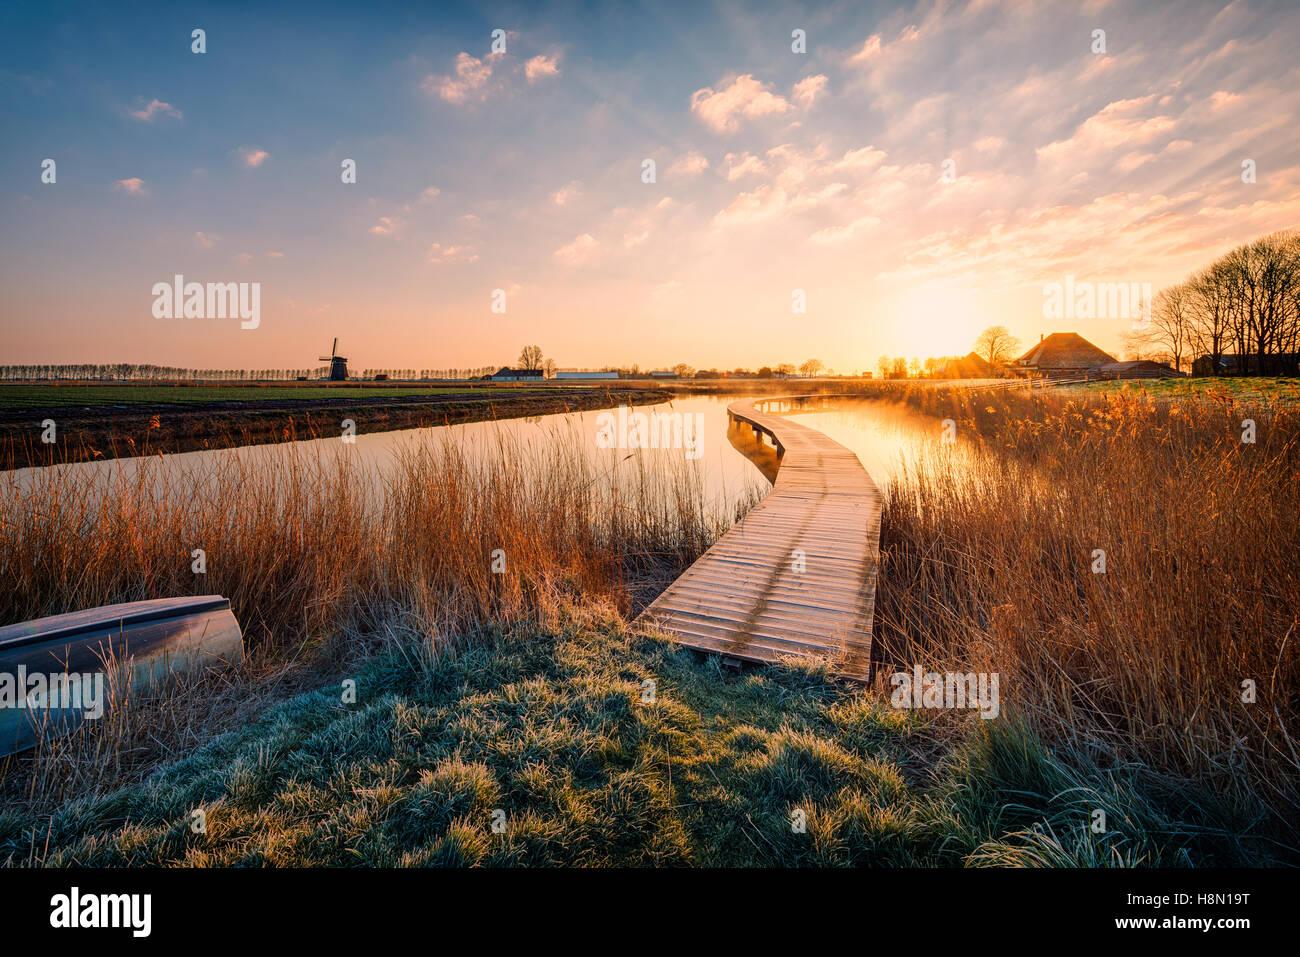 Holländische Polderlandschaft bei Sonnenaufgang Stockbild